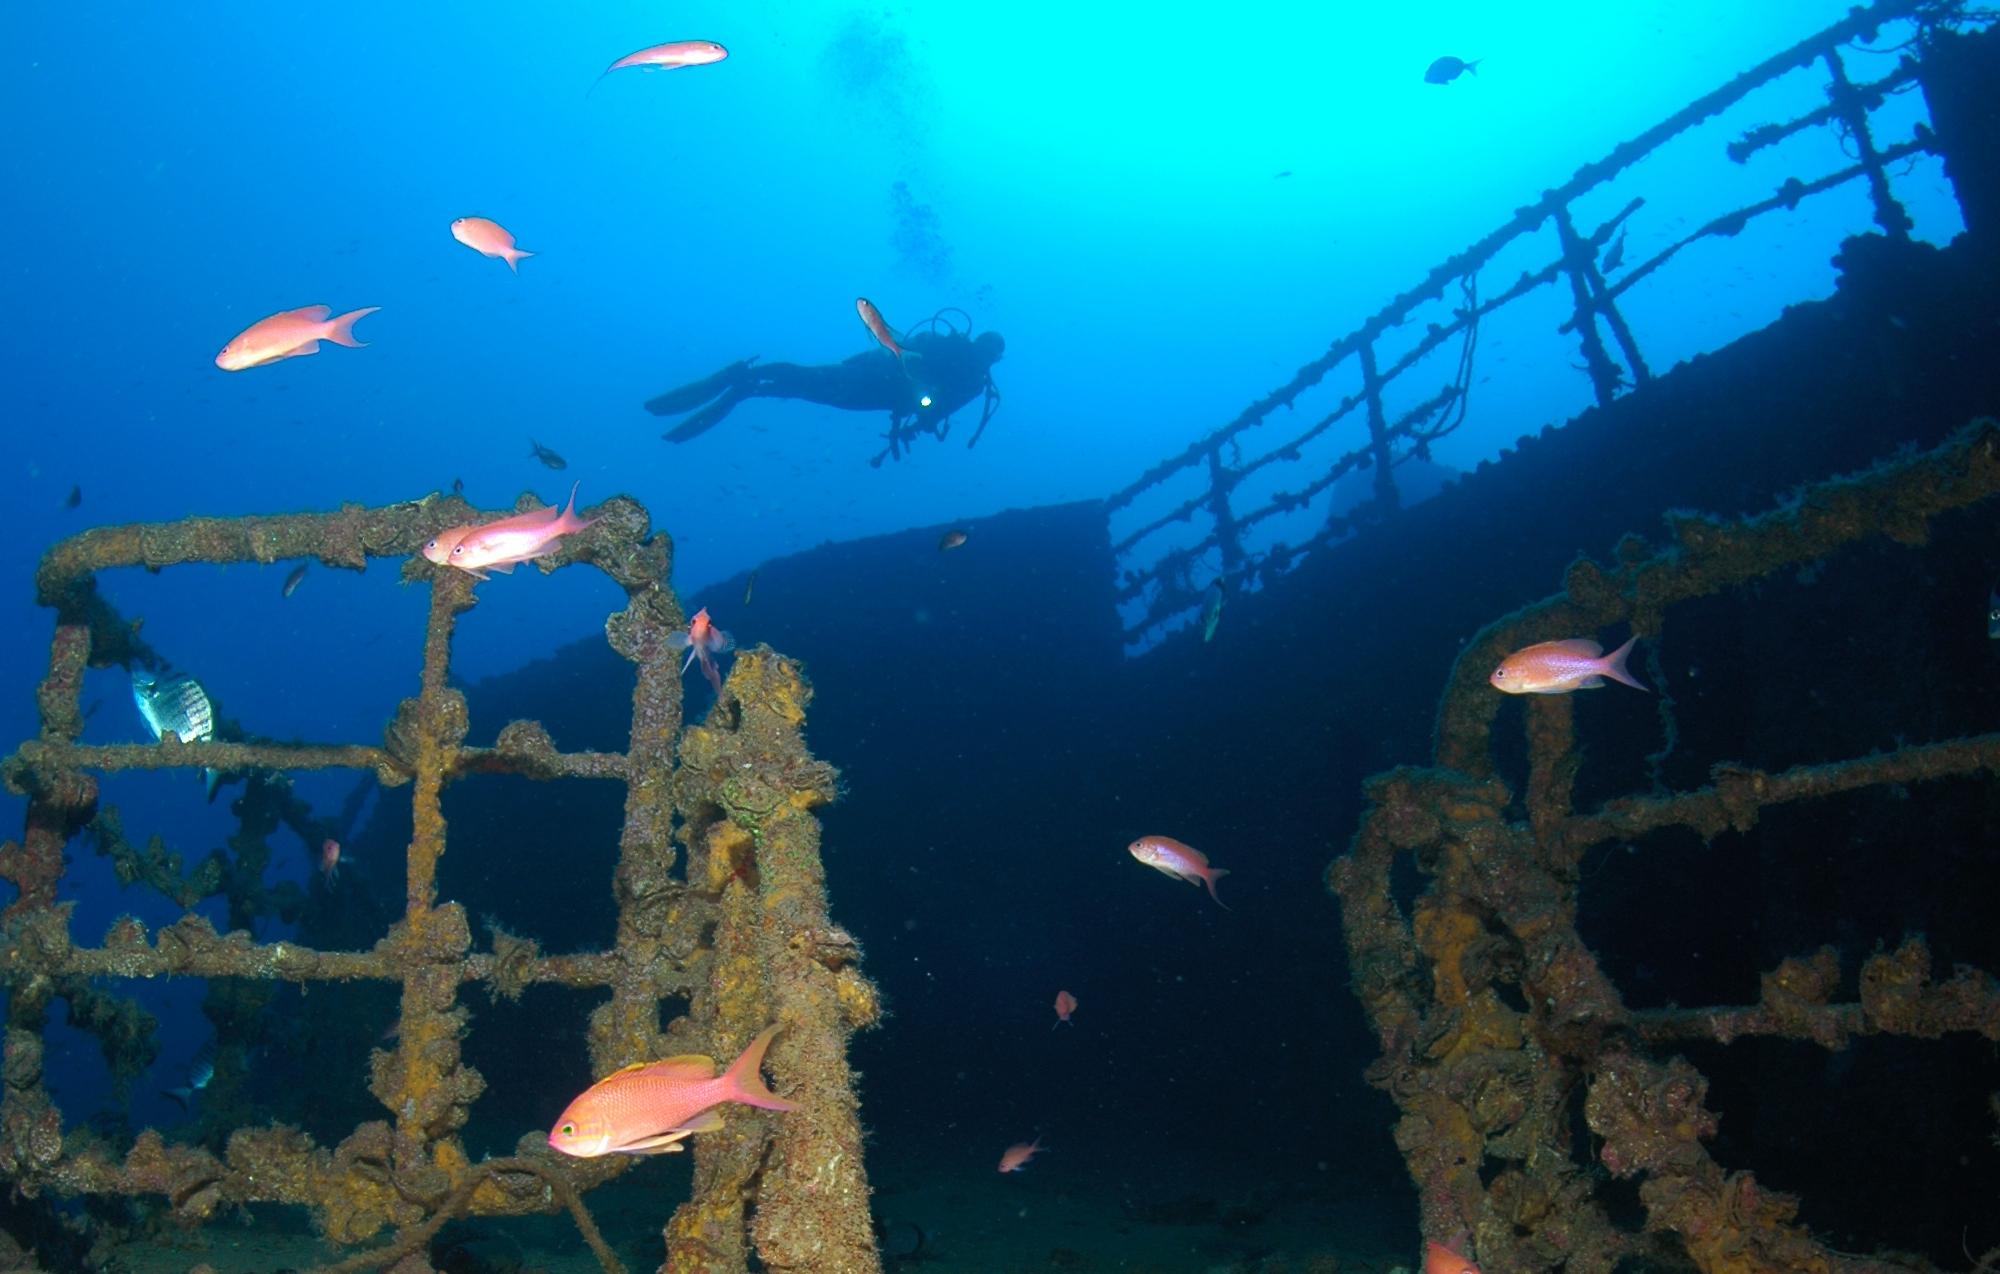 tauchkurs-open-water-diver-beginner-in-nordhausen-bg3